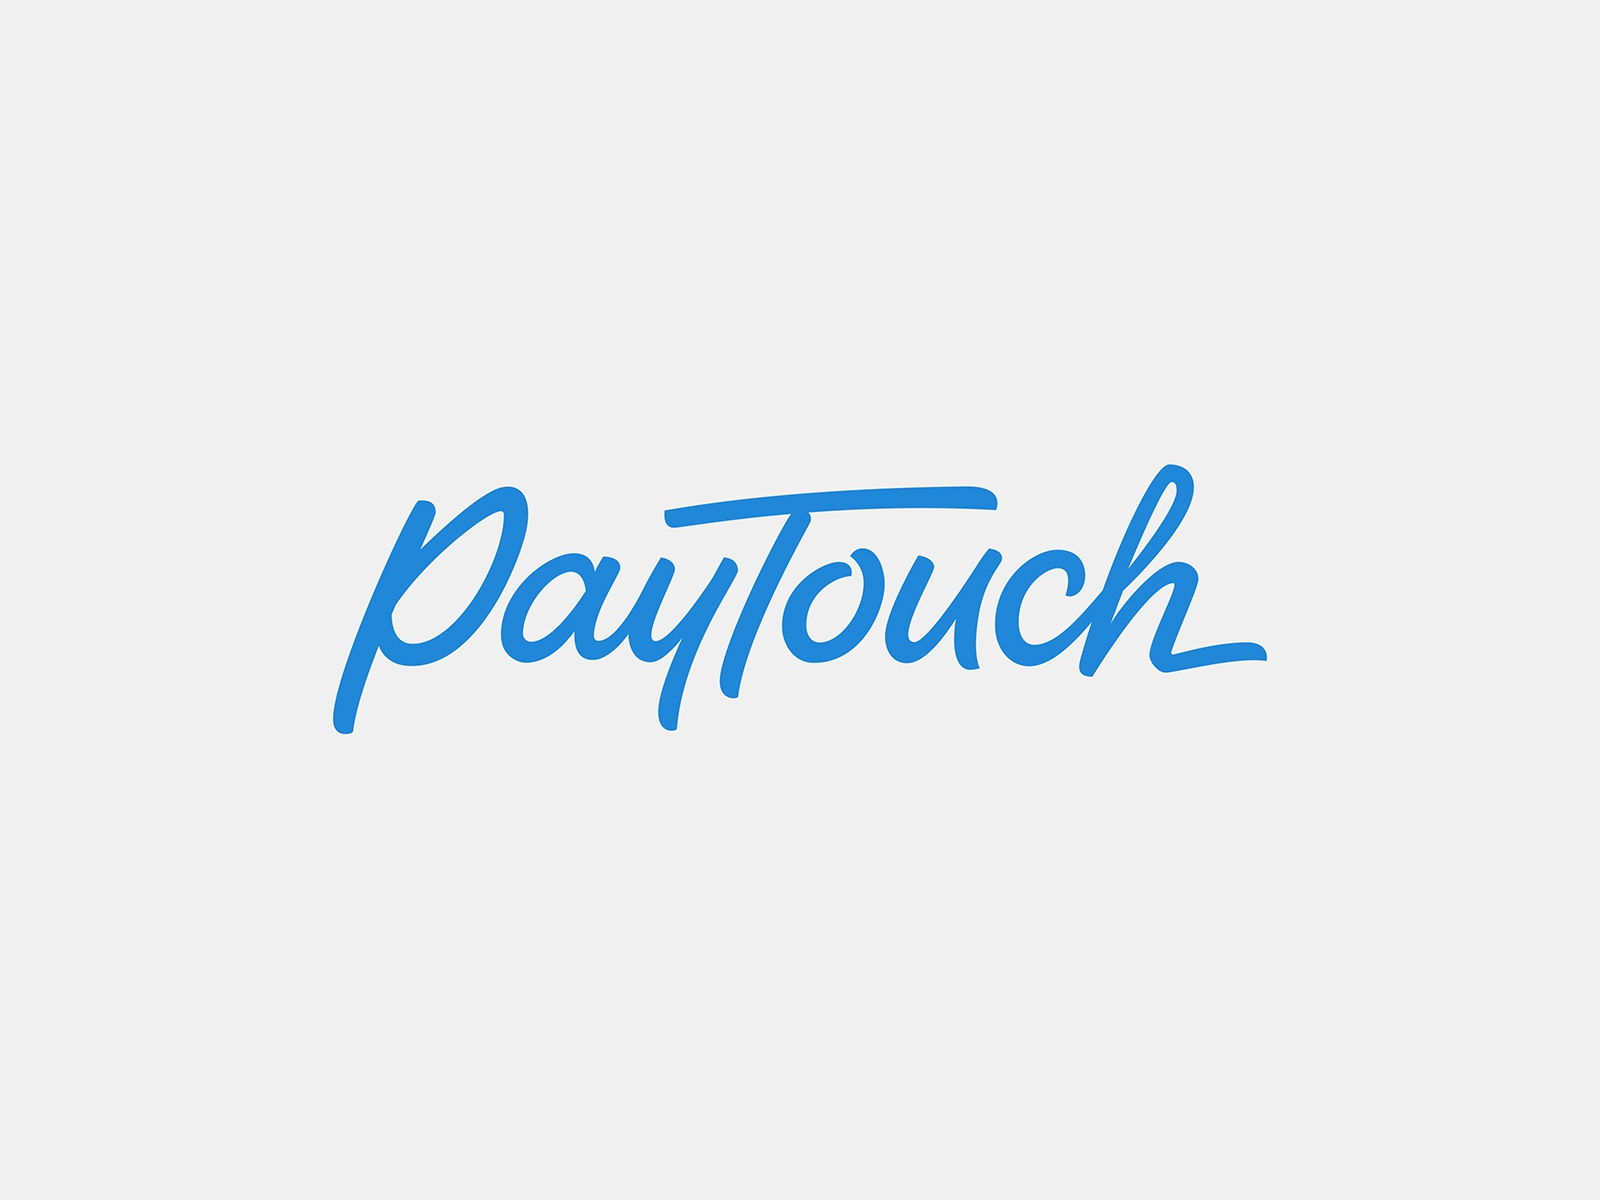 Paytouch logotype